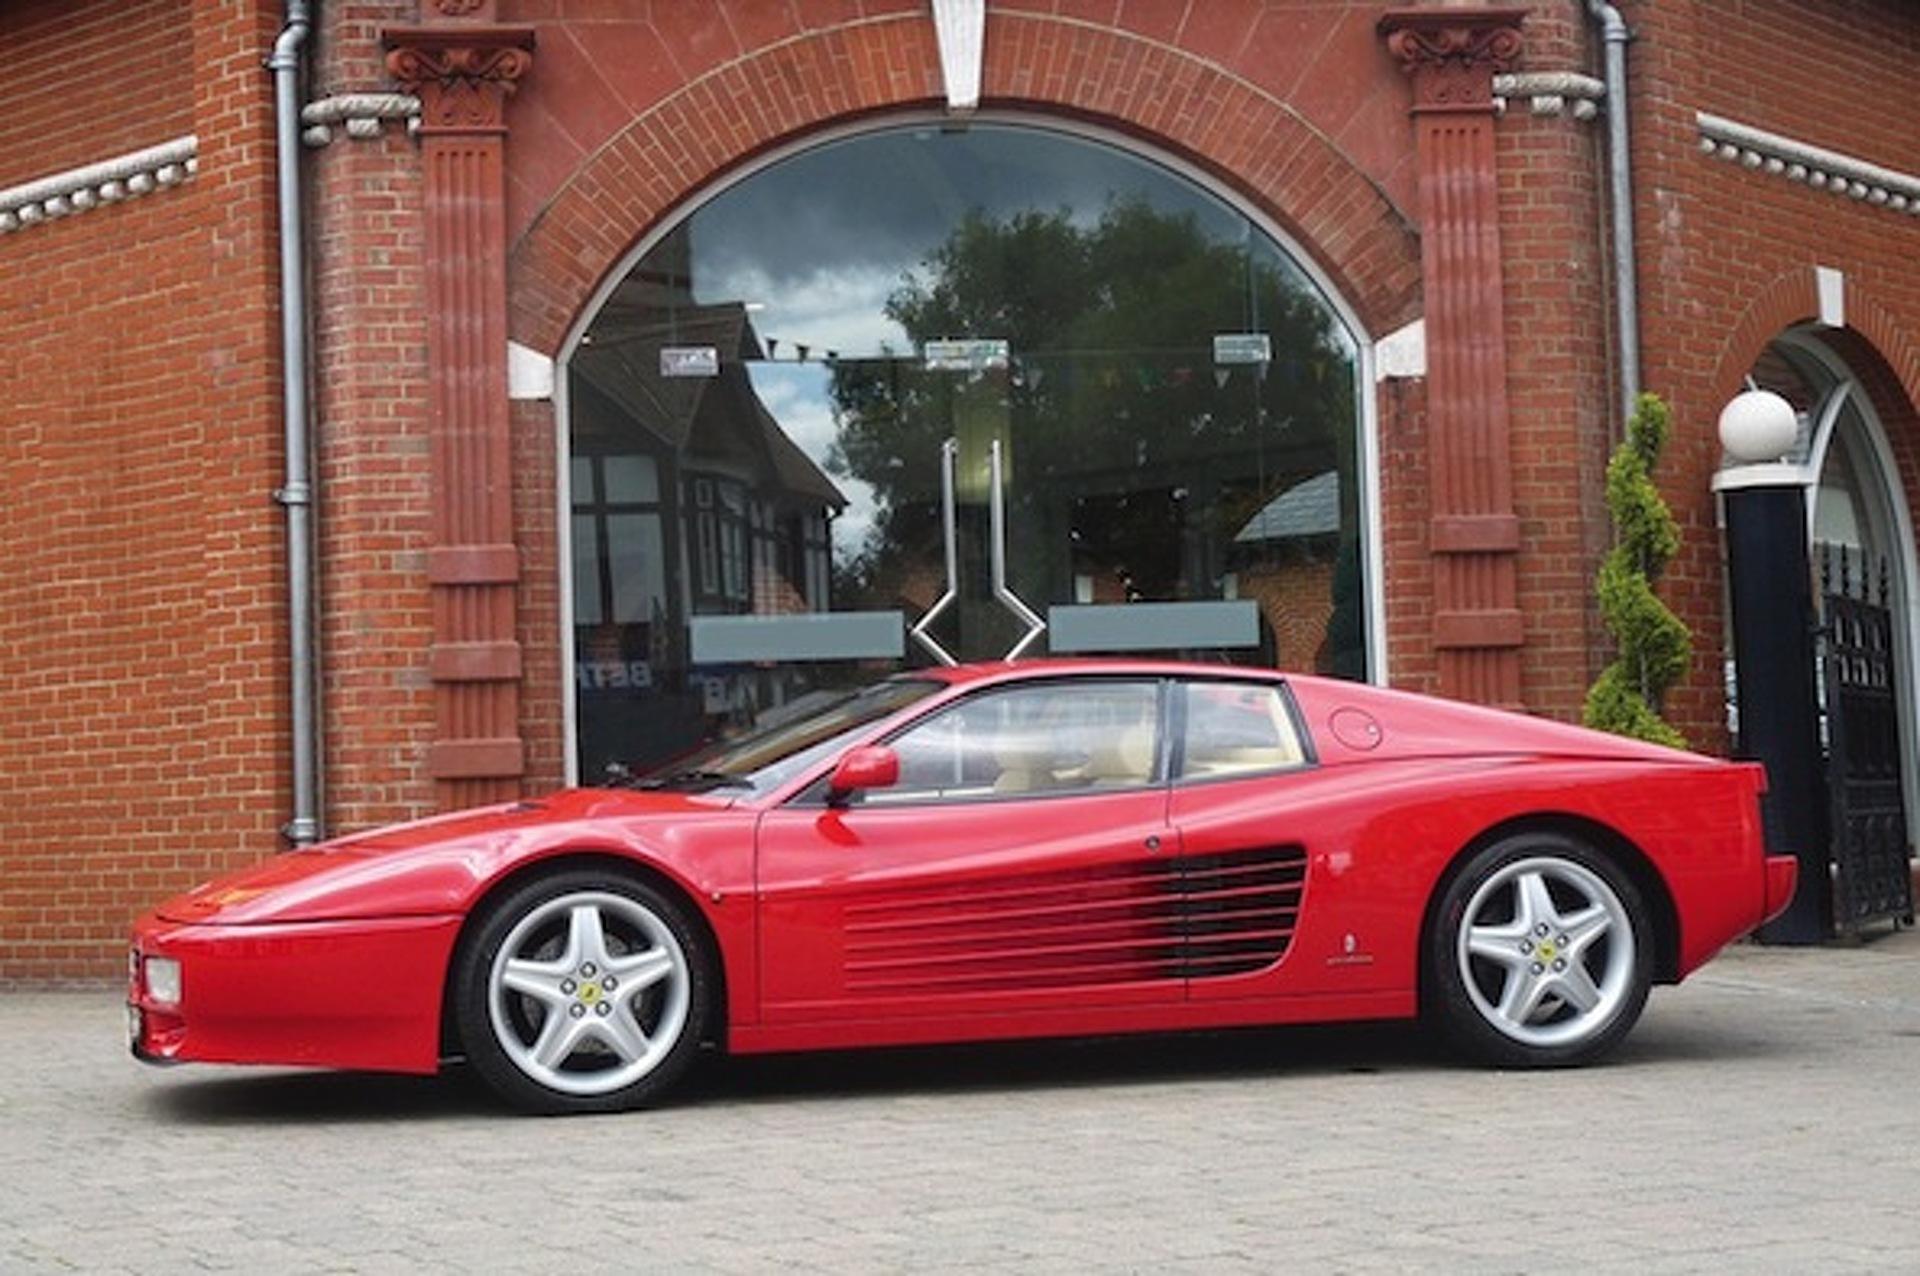 Elton John's Pristine Ferrari 512 TR Headed to Auction